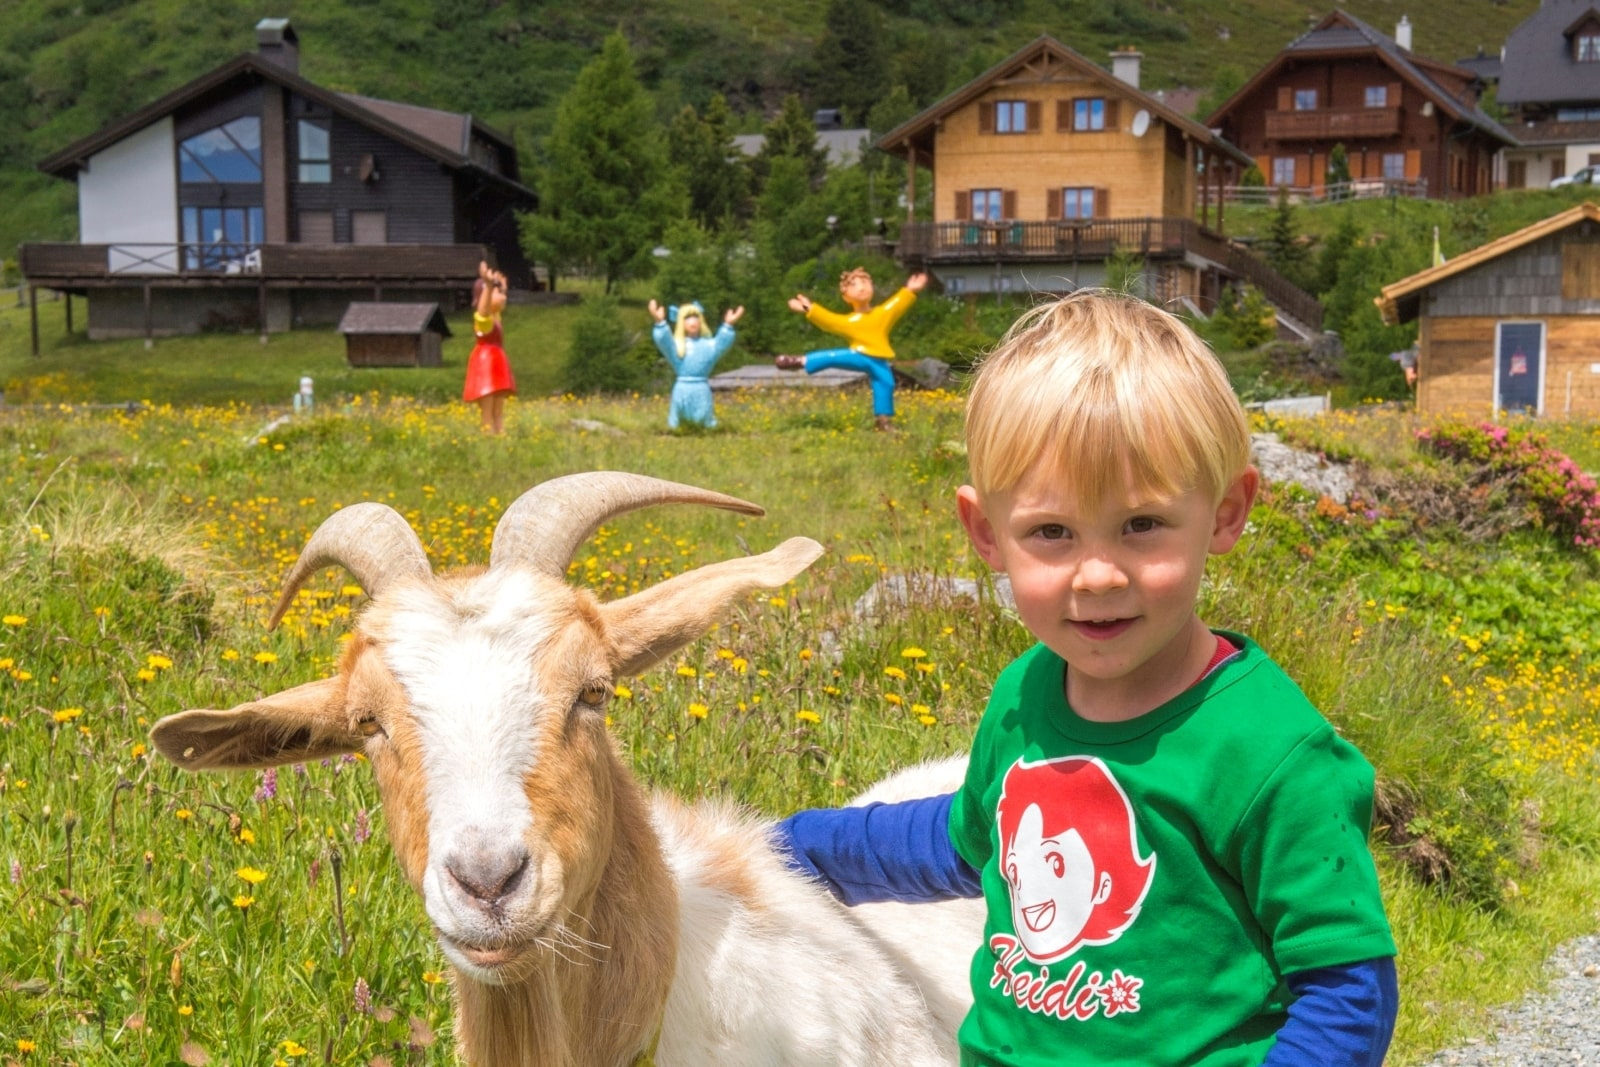 Heidi-Chalet-Falkert-Heidialm-Falkertsee-Kinder-Ziege